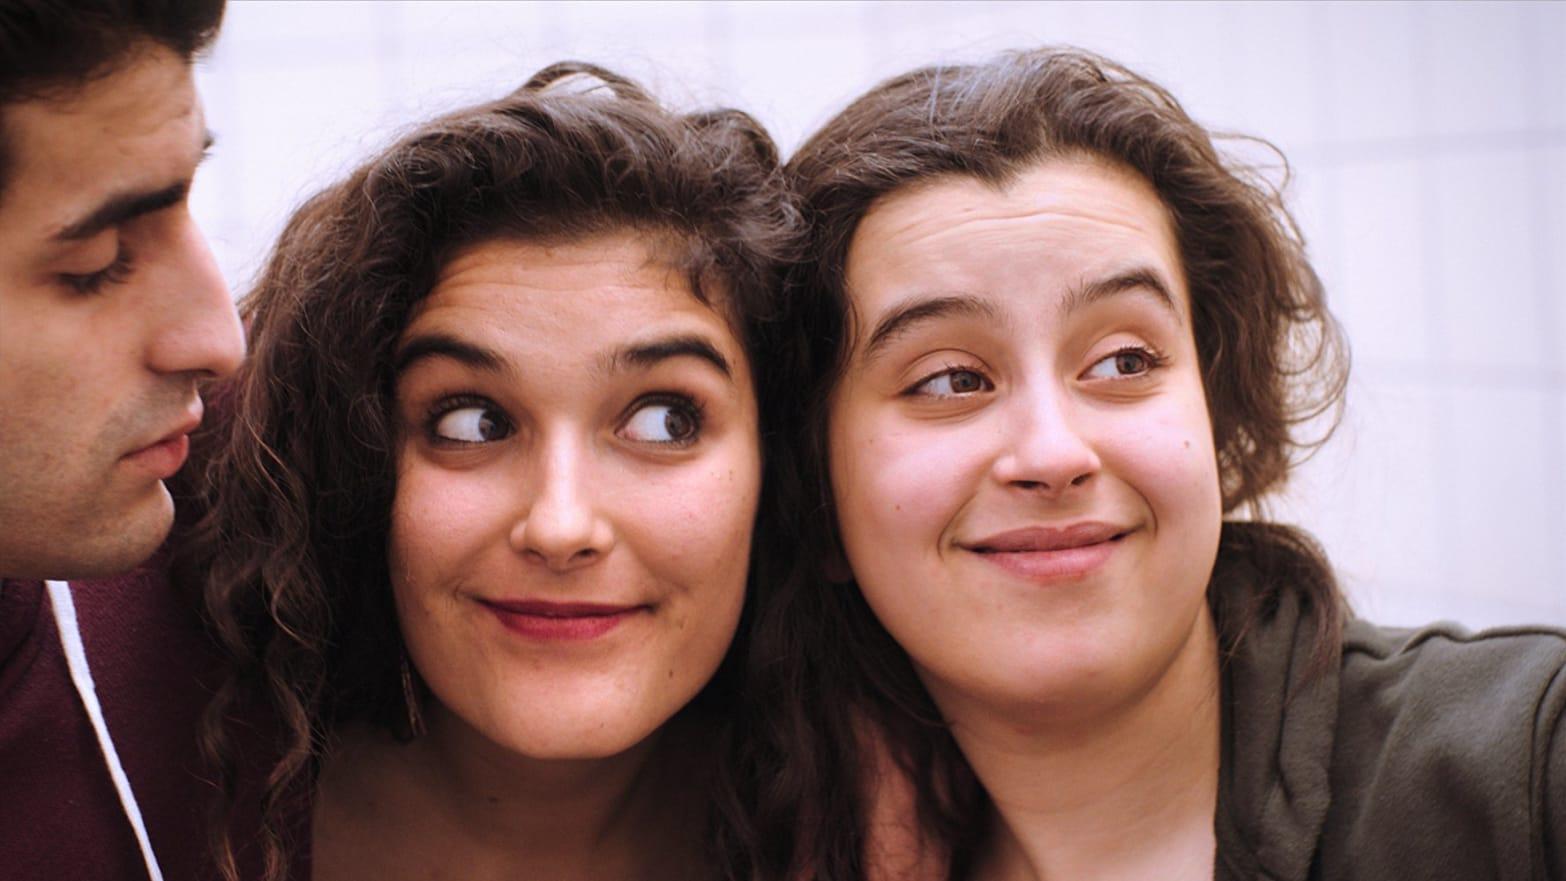 Inside Cannes Raunchy Muslim Teen Blowjob Comedy